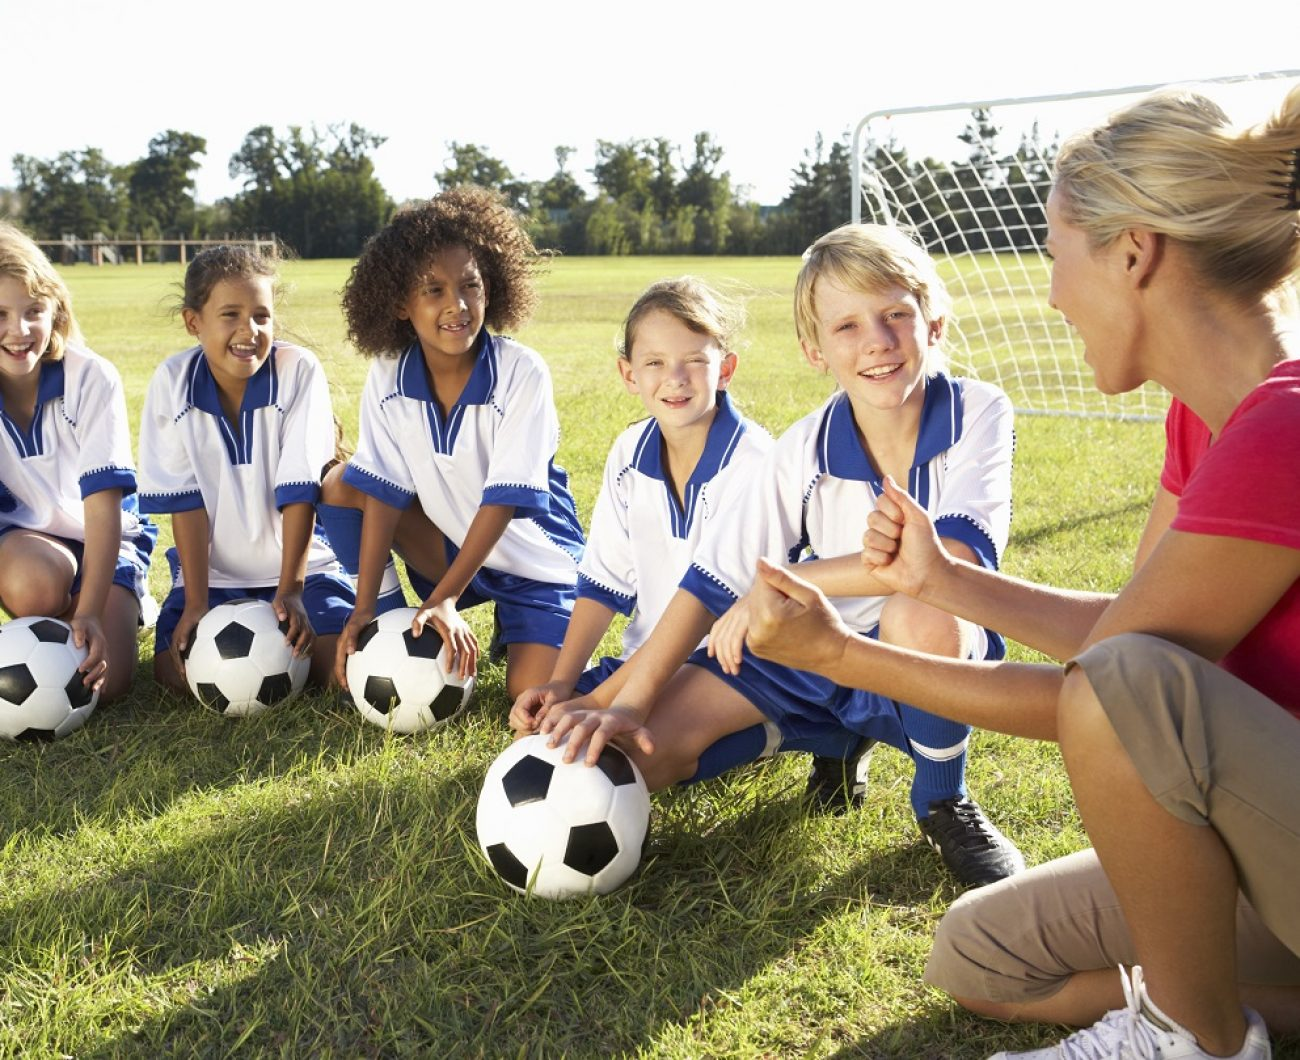 Female football coach and team